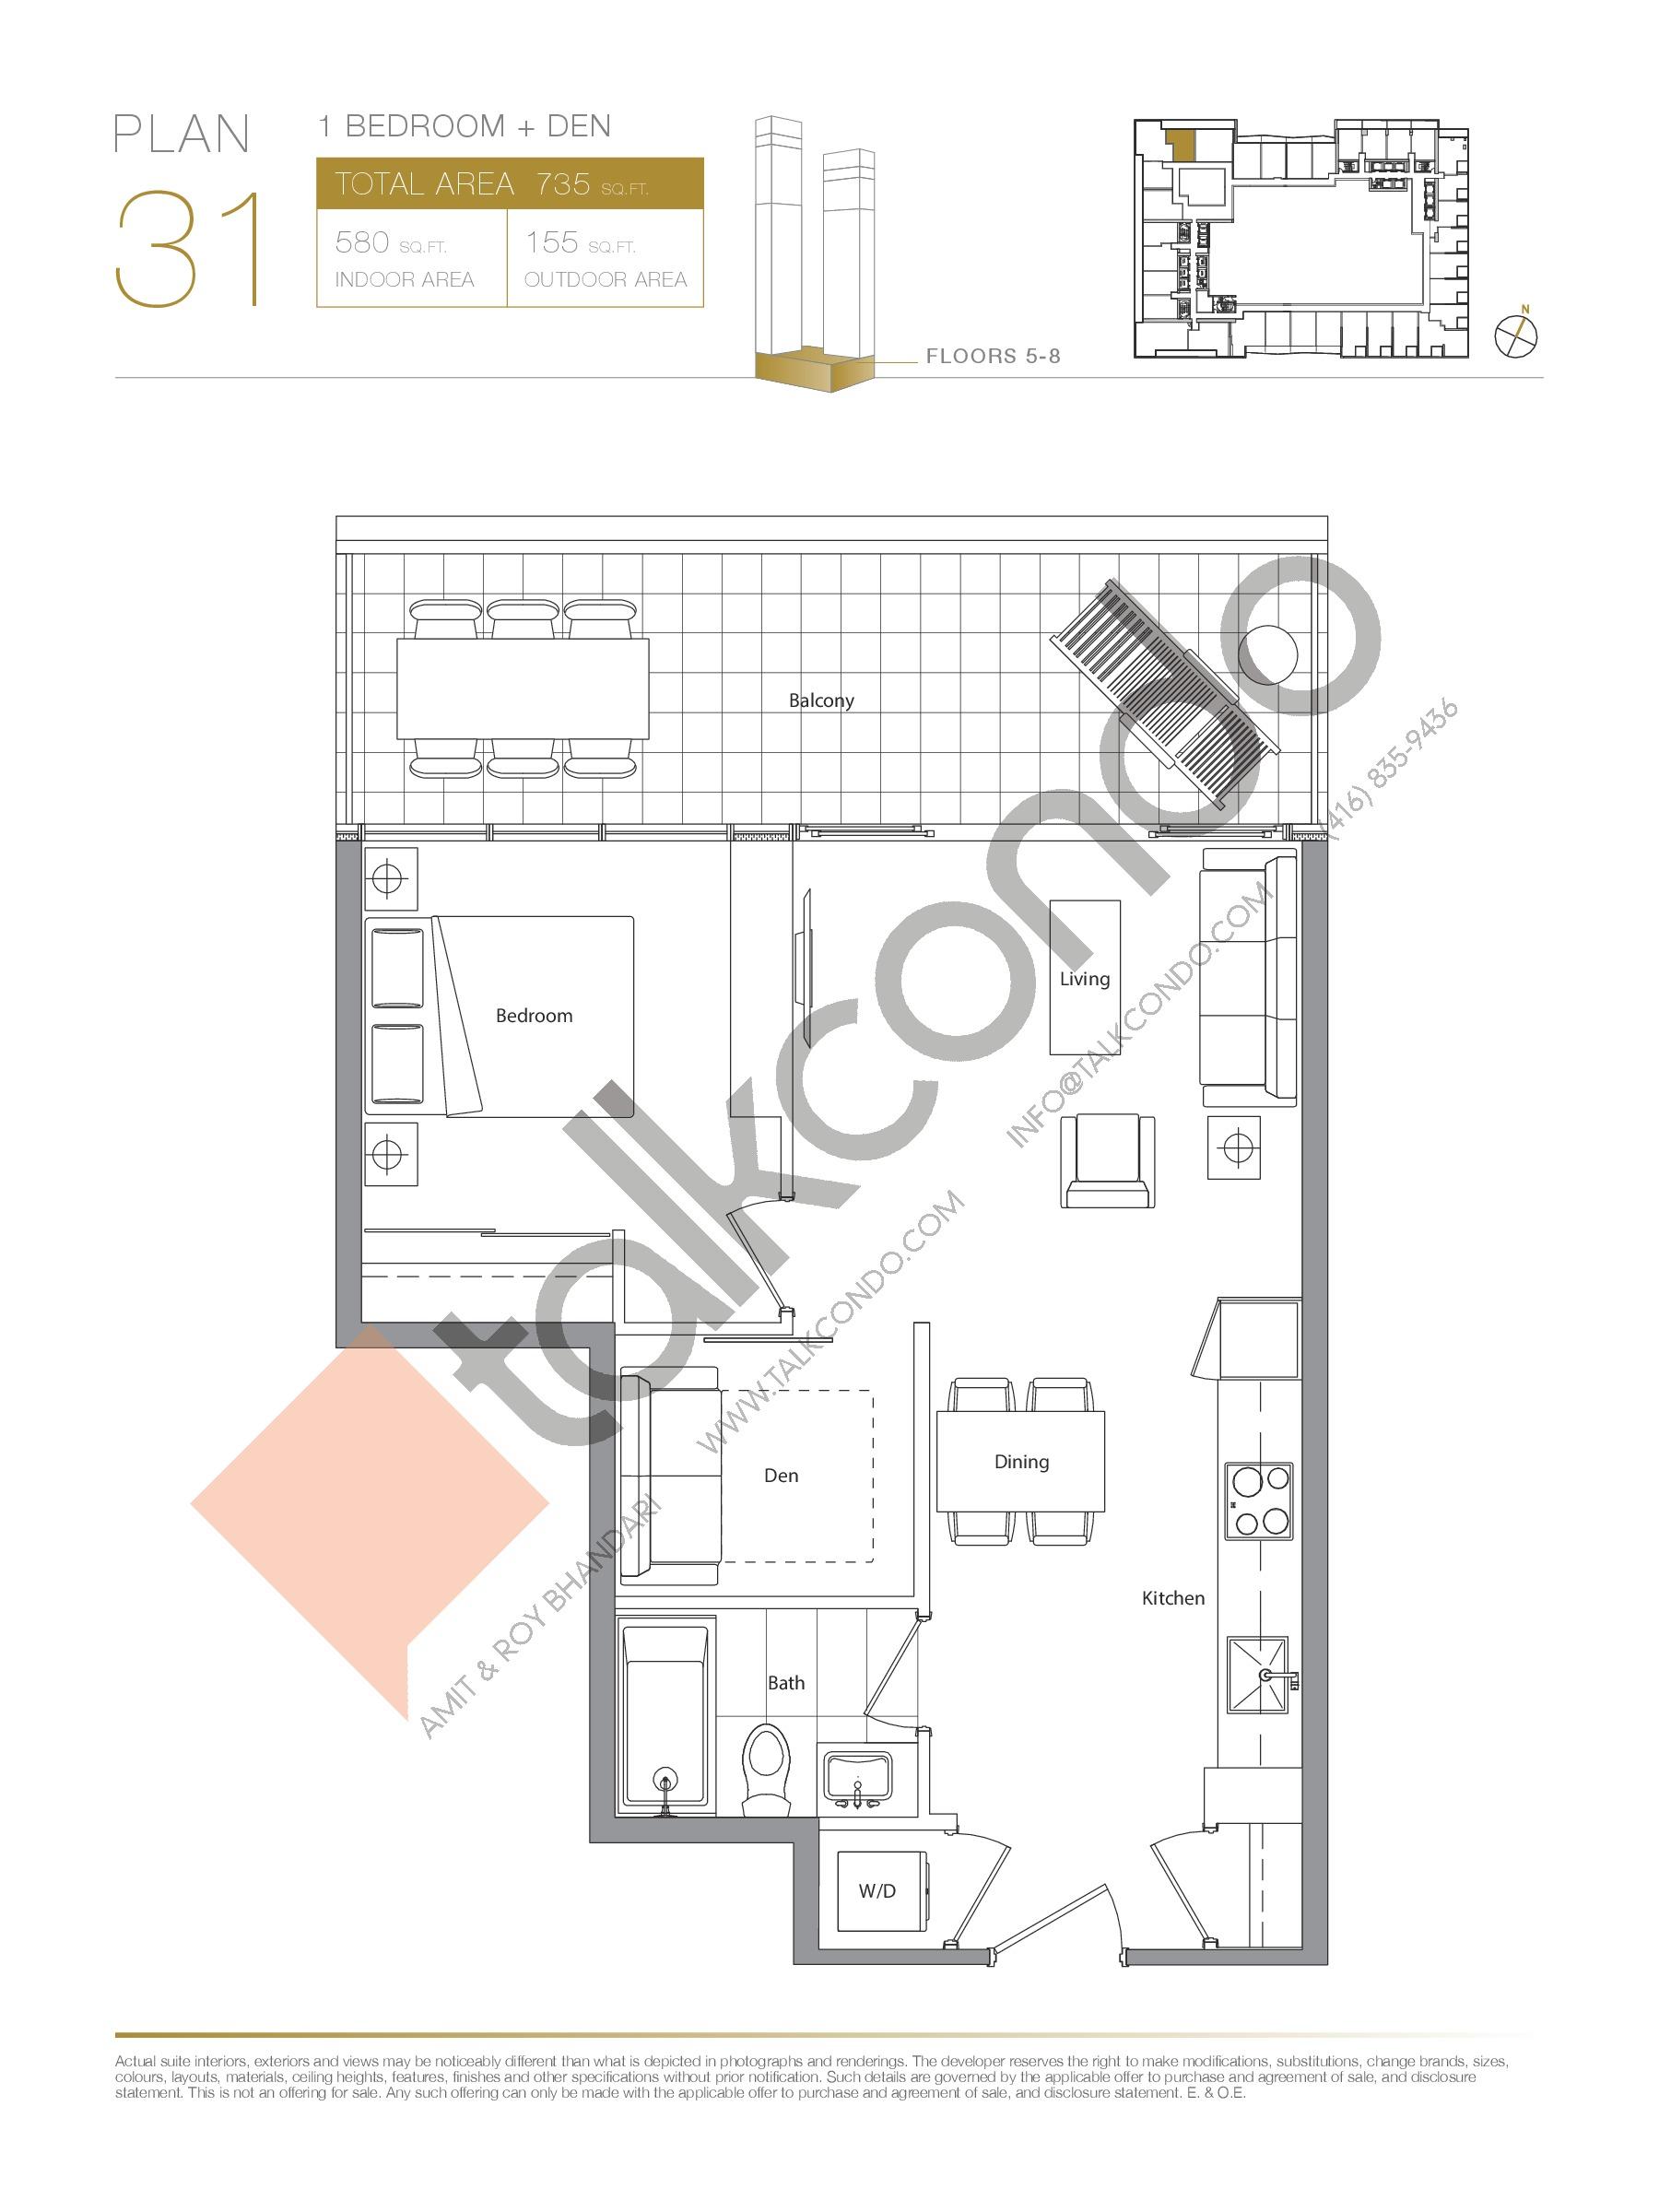 Plan 31 Floor Plan at Concord Canada House Condos - 580 sq.ft